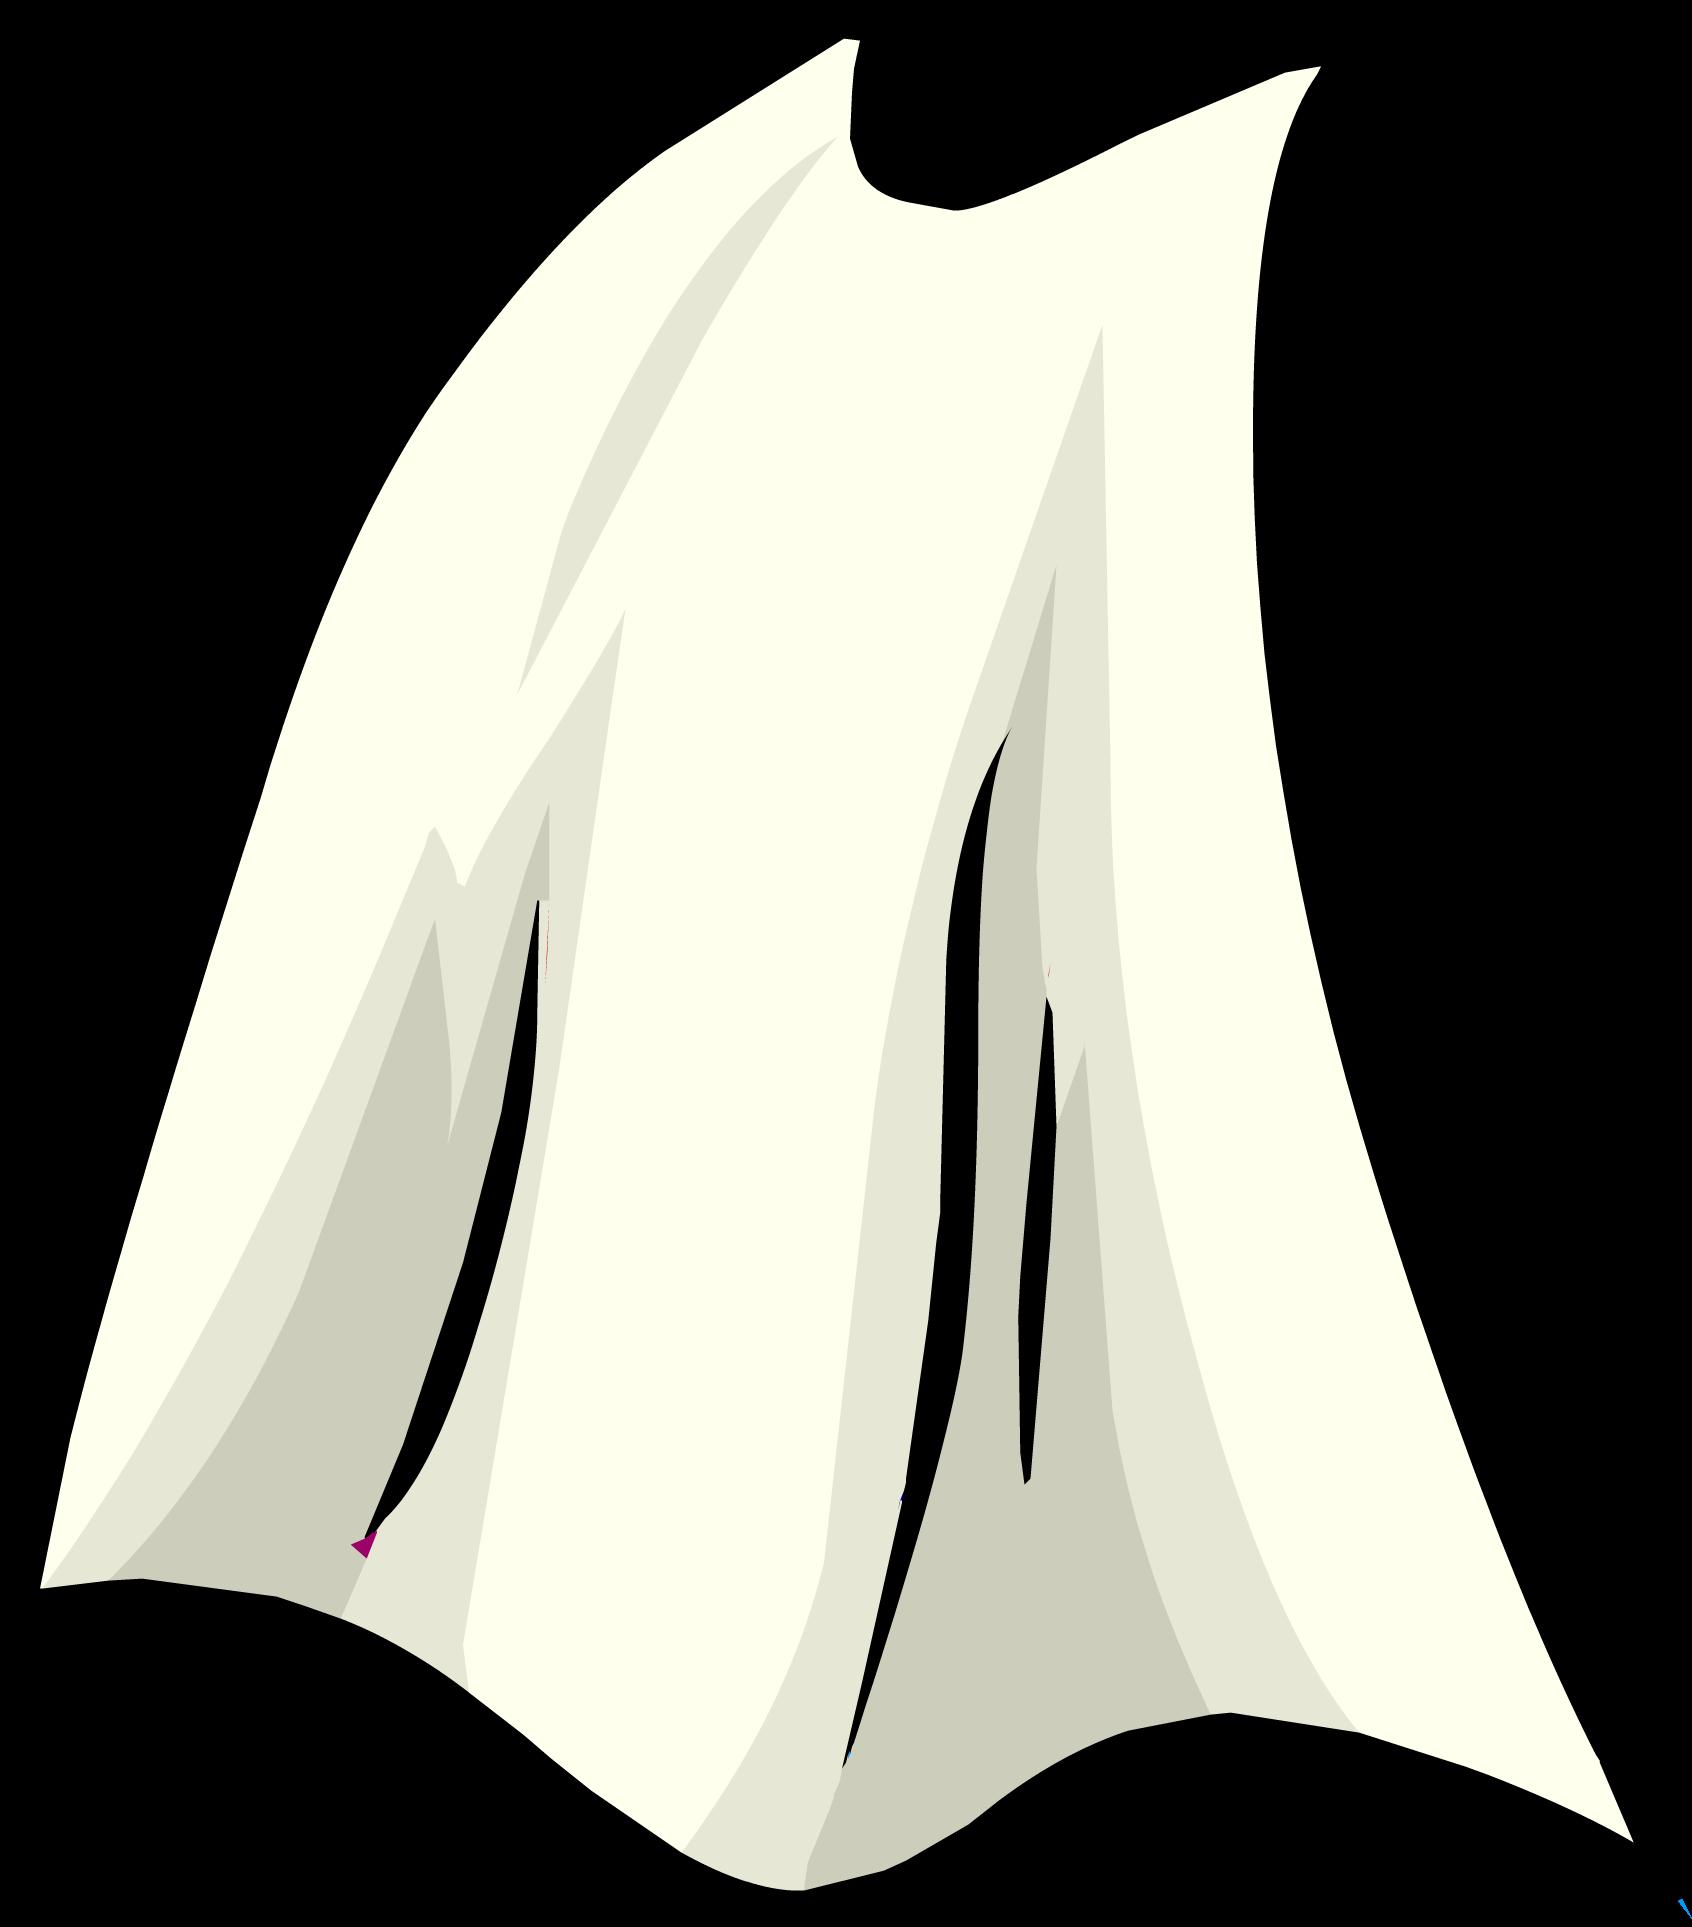 white cape club penguin wiki fandom powered by wikia Superhero Cape Outline Superhero Cape Coloring Page